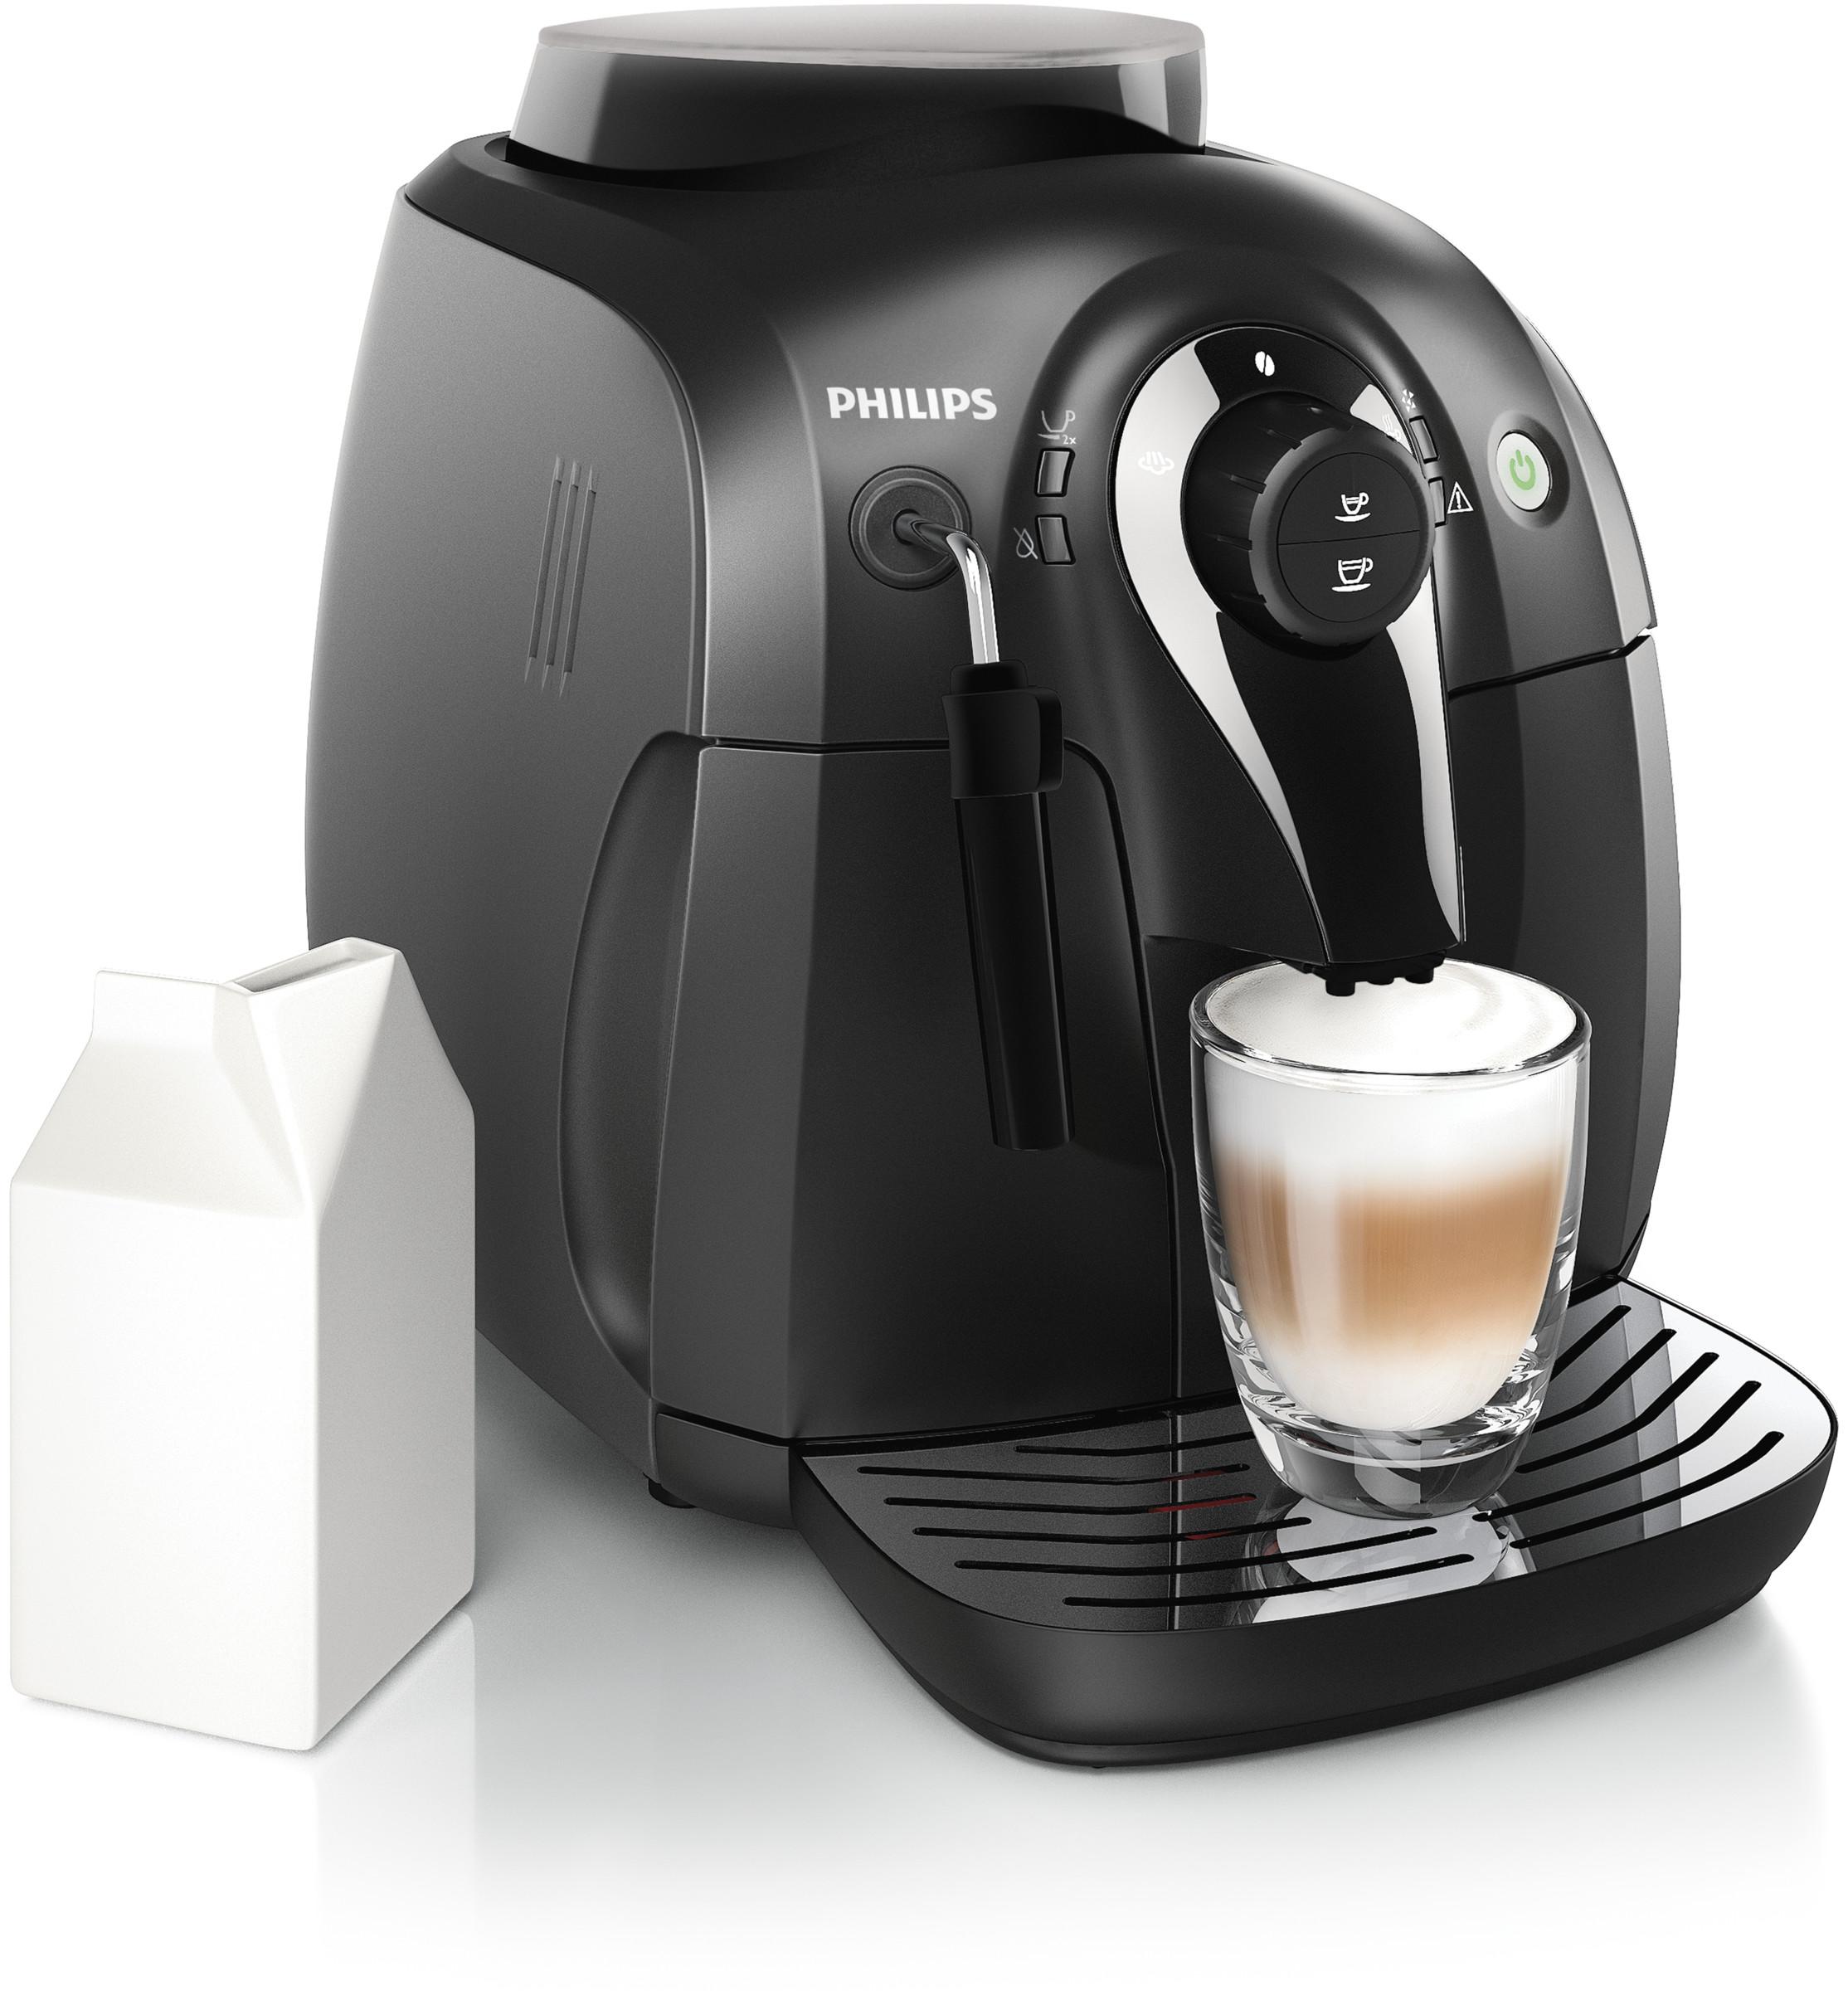 Philips Saeco Series 2000 Vapore Super Automatic Espresso